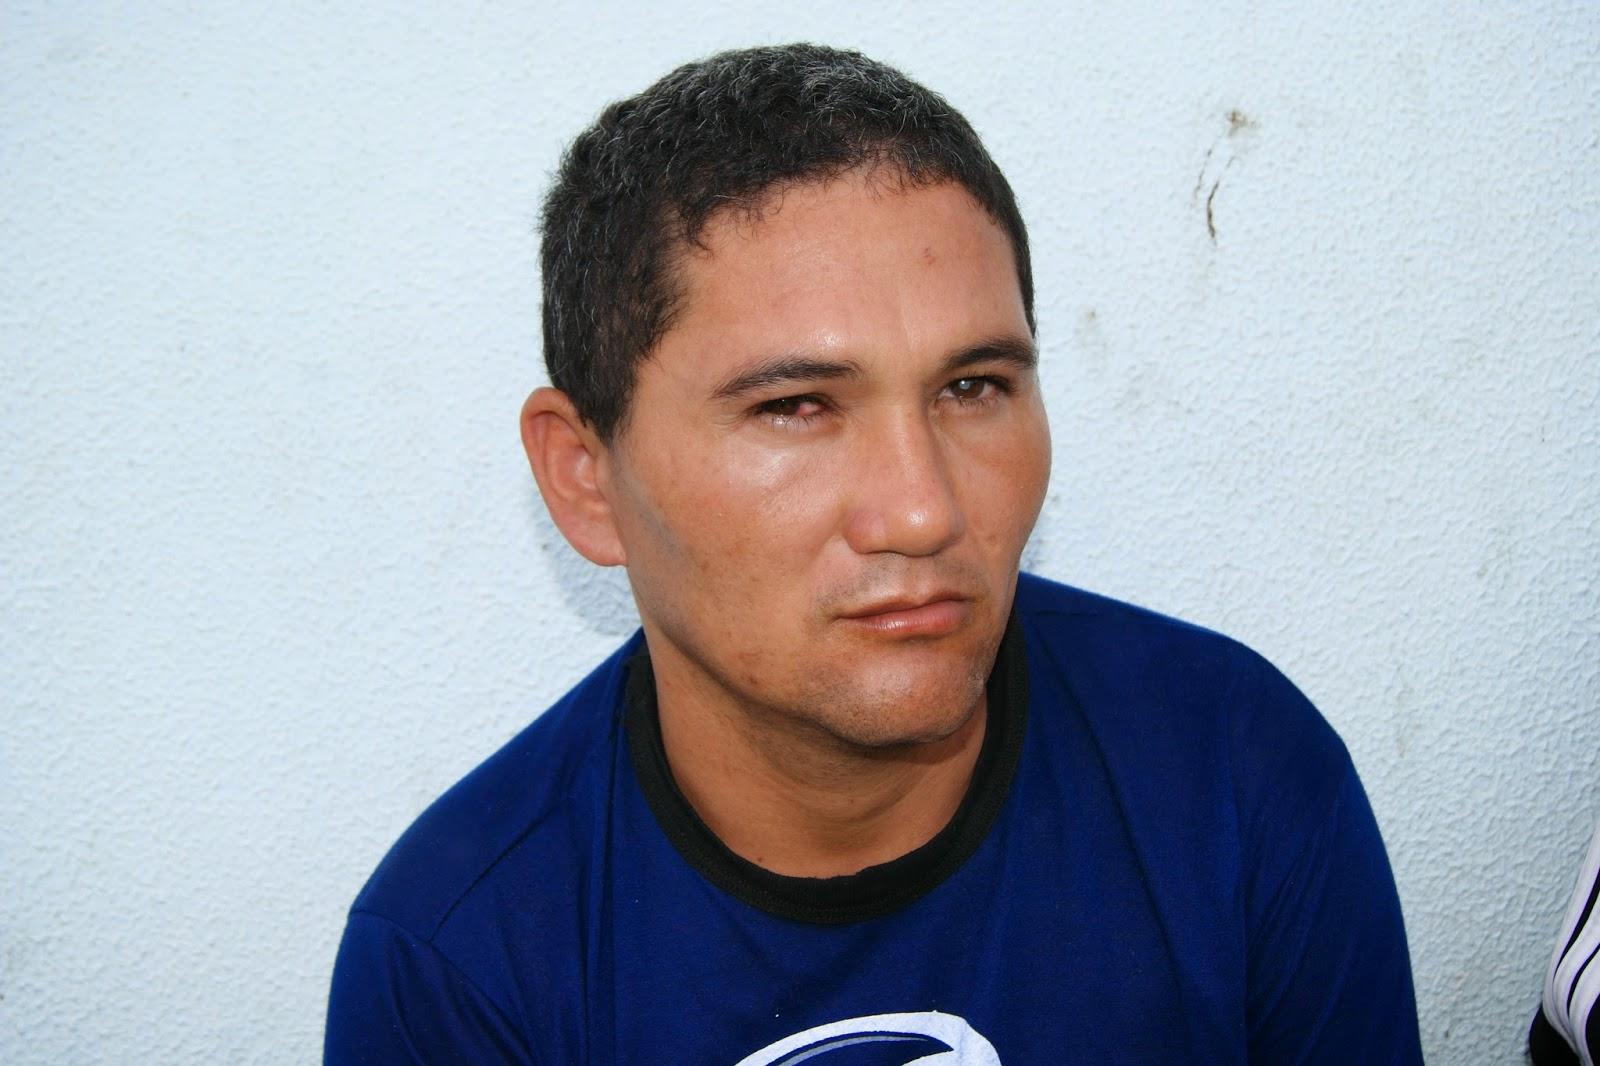 Polícia do Rio prende <b>acusado</b> de abuso sexual 2014